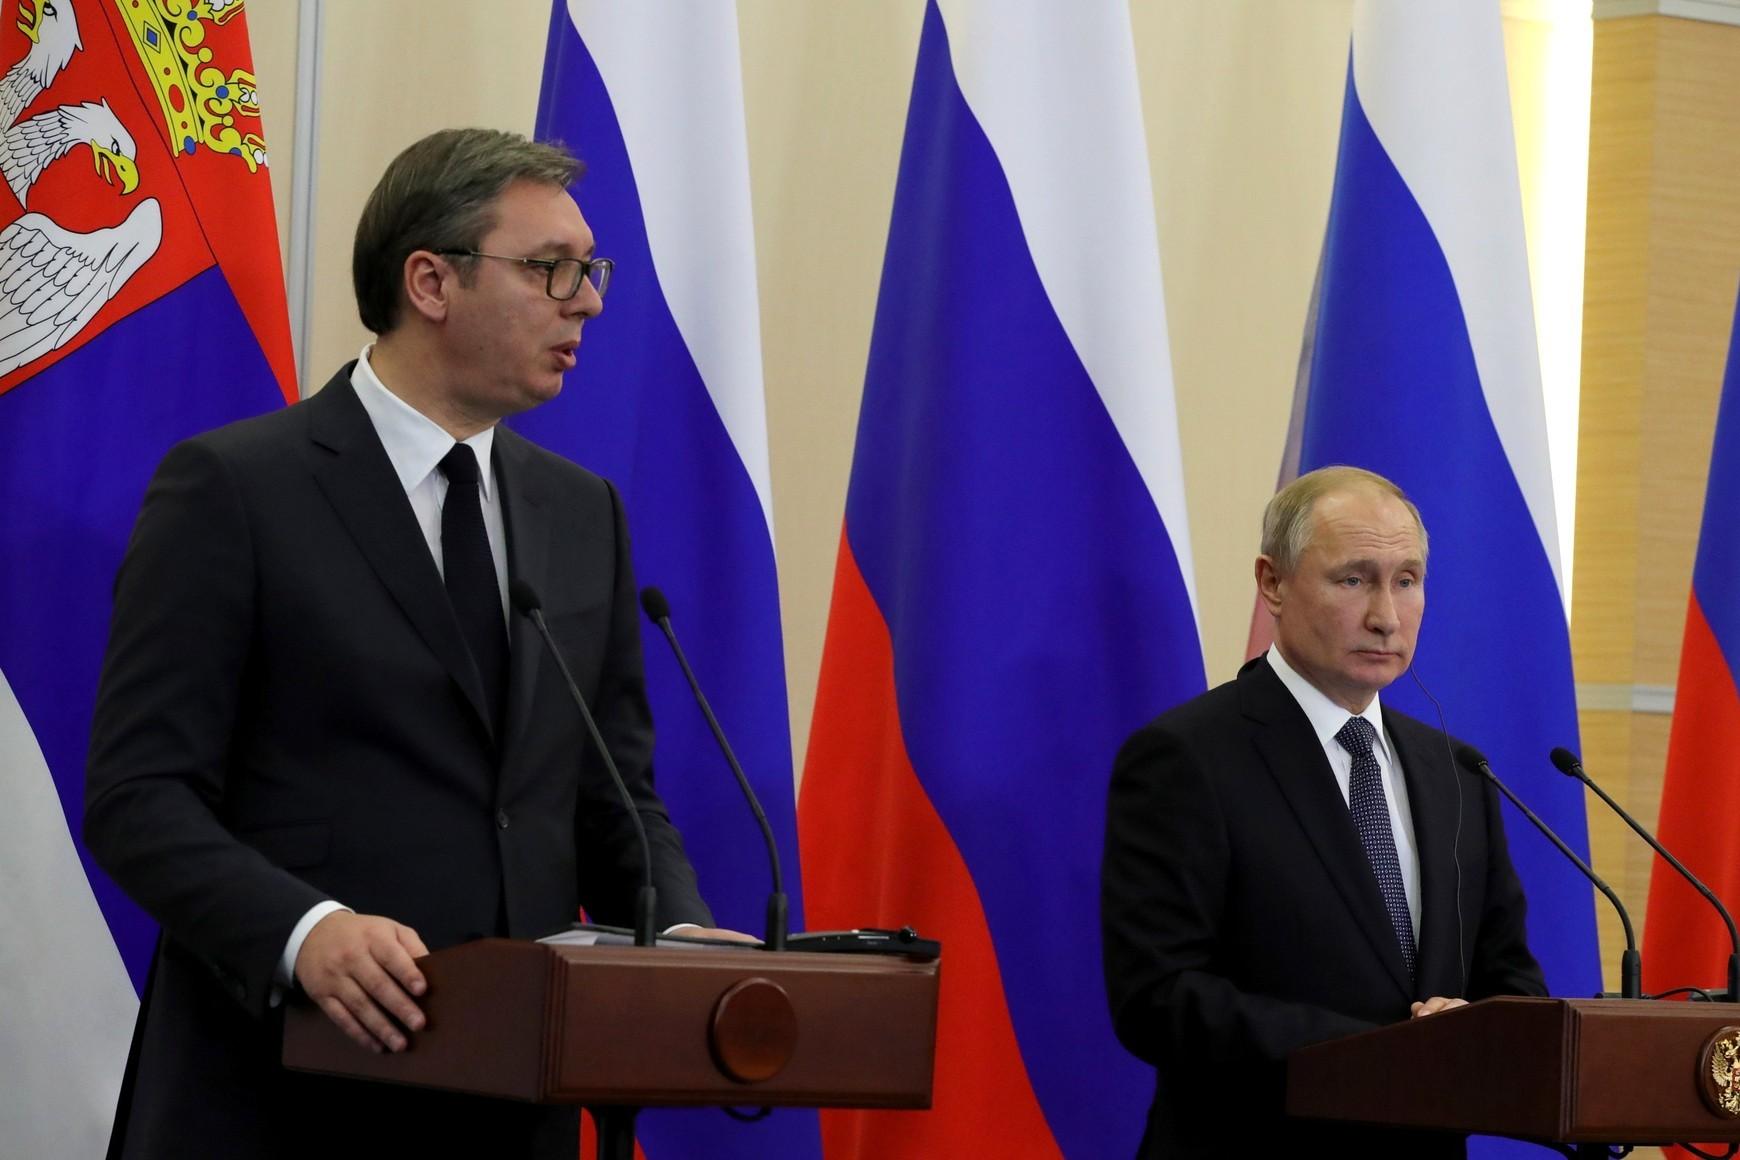 Predsednik Srbije Aleksandar Vučić i predsednik Rusije Vladimir Putin tokom zajedničke konferencije za medije nakon sastanka, Soči, 04. decembar 2019. (Foto: kremlin.ru)